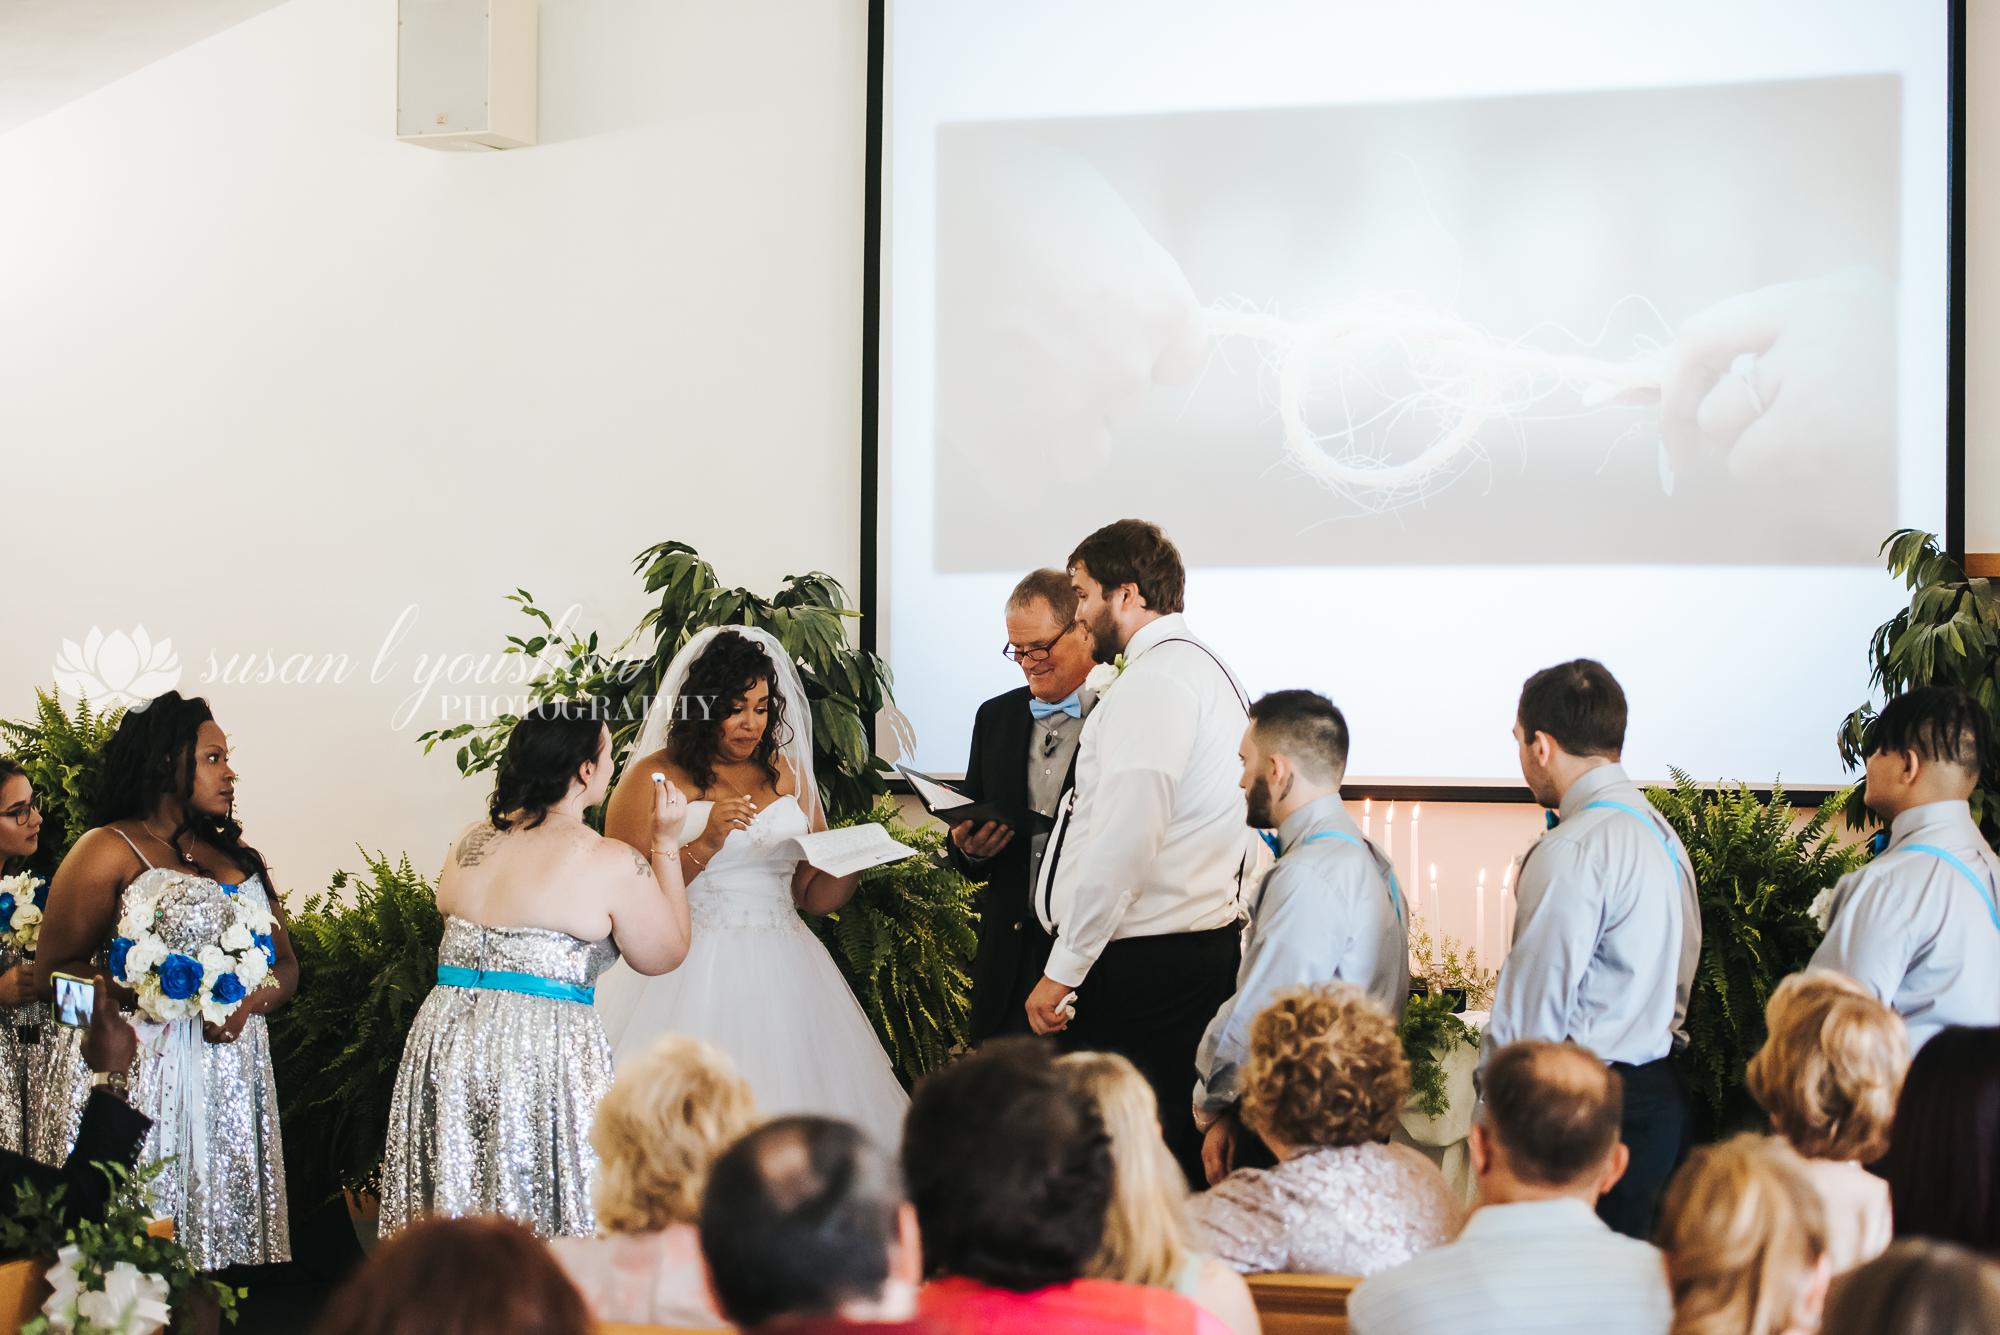 Katelyn and Wes Wedding Photos 07-13-2019 SLY Photography-72.jpg